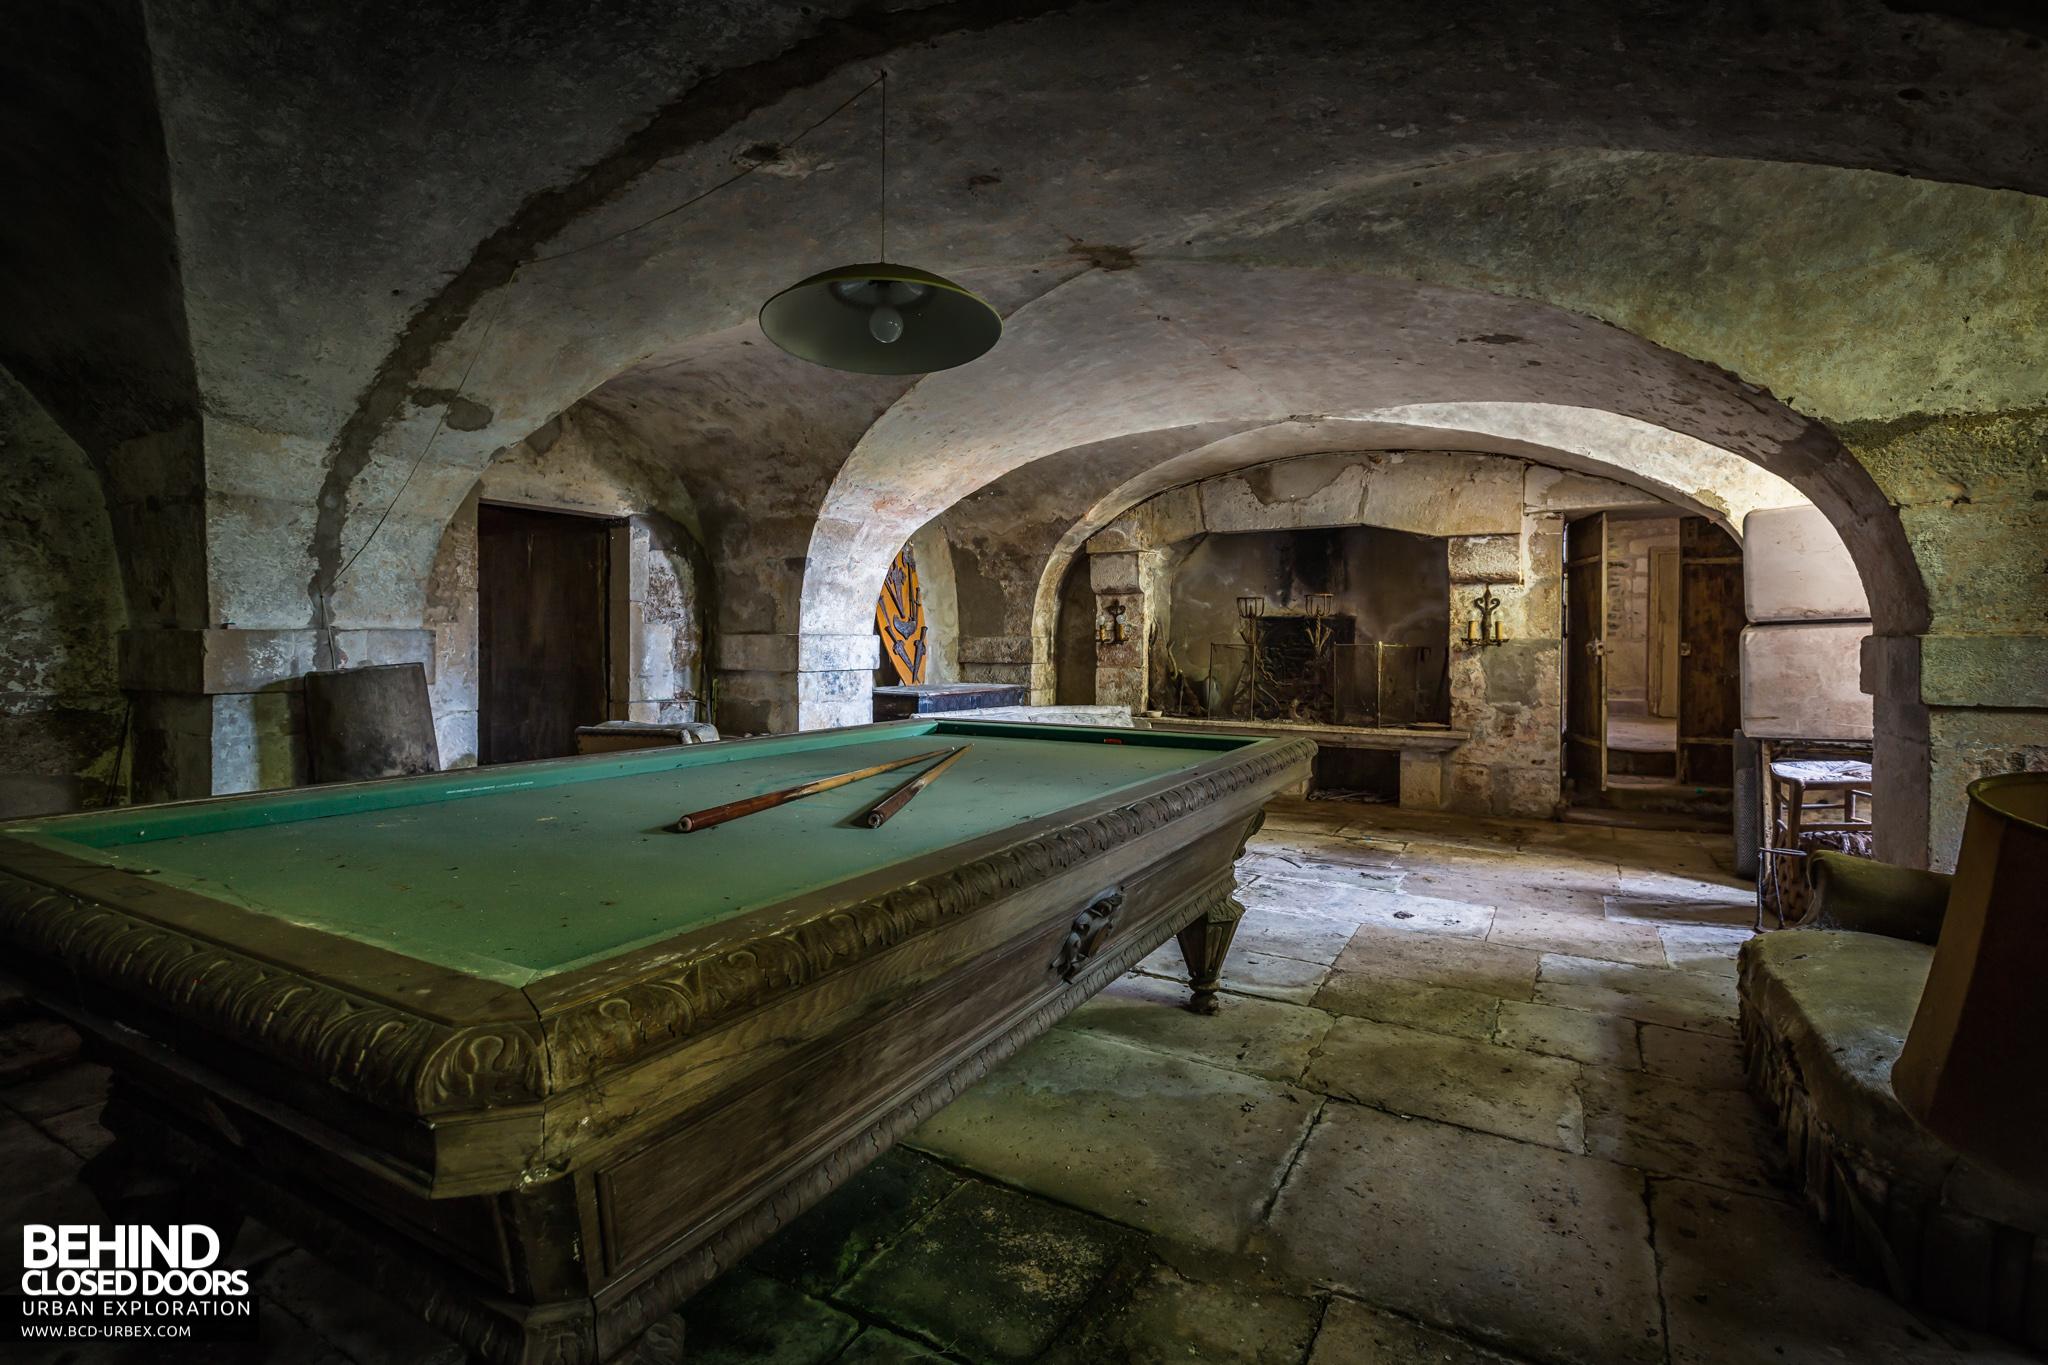 chateau-french-house-12.jpg